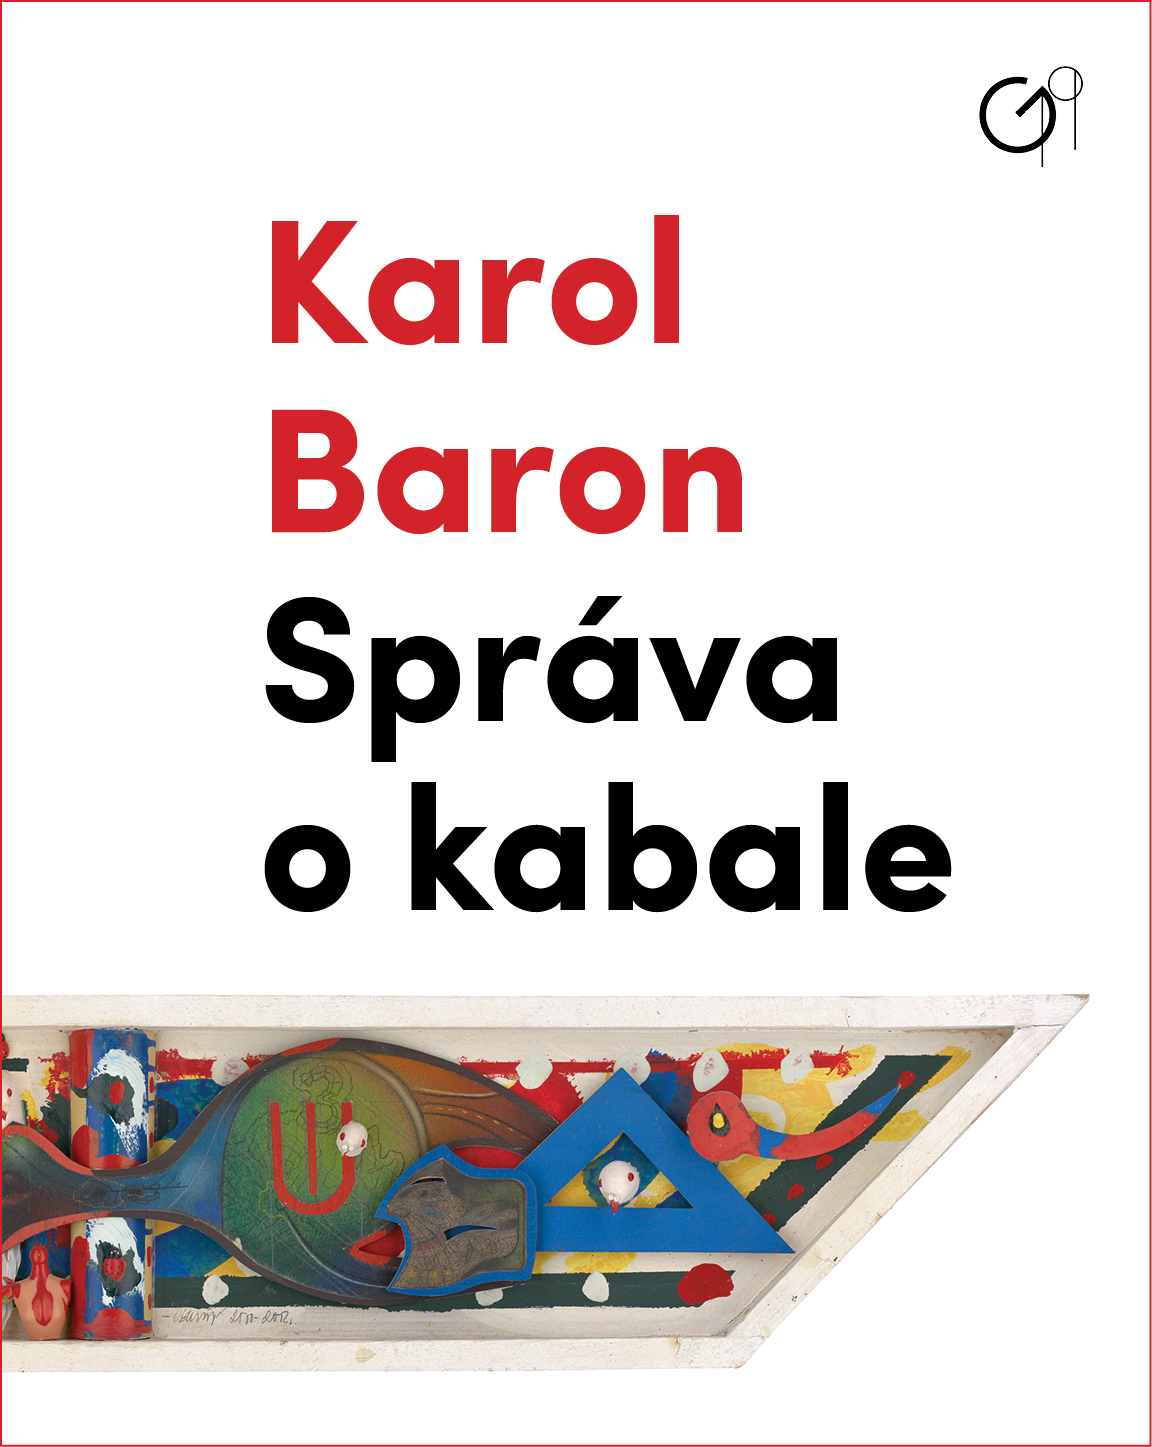 Karol Baron exhibition catalogue, 2019